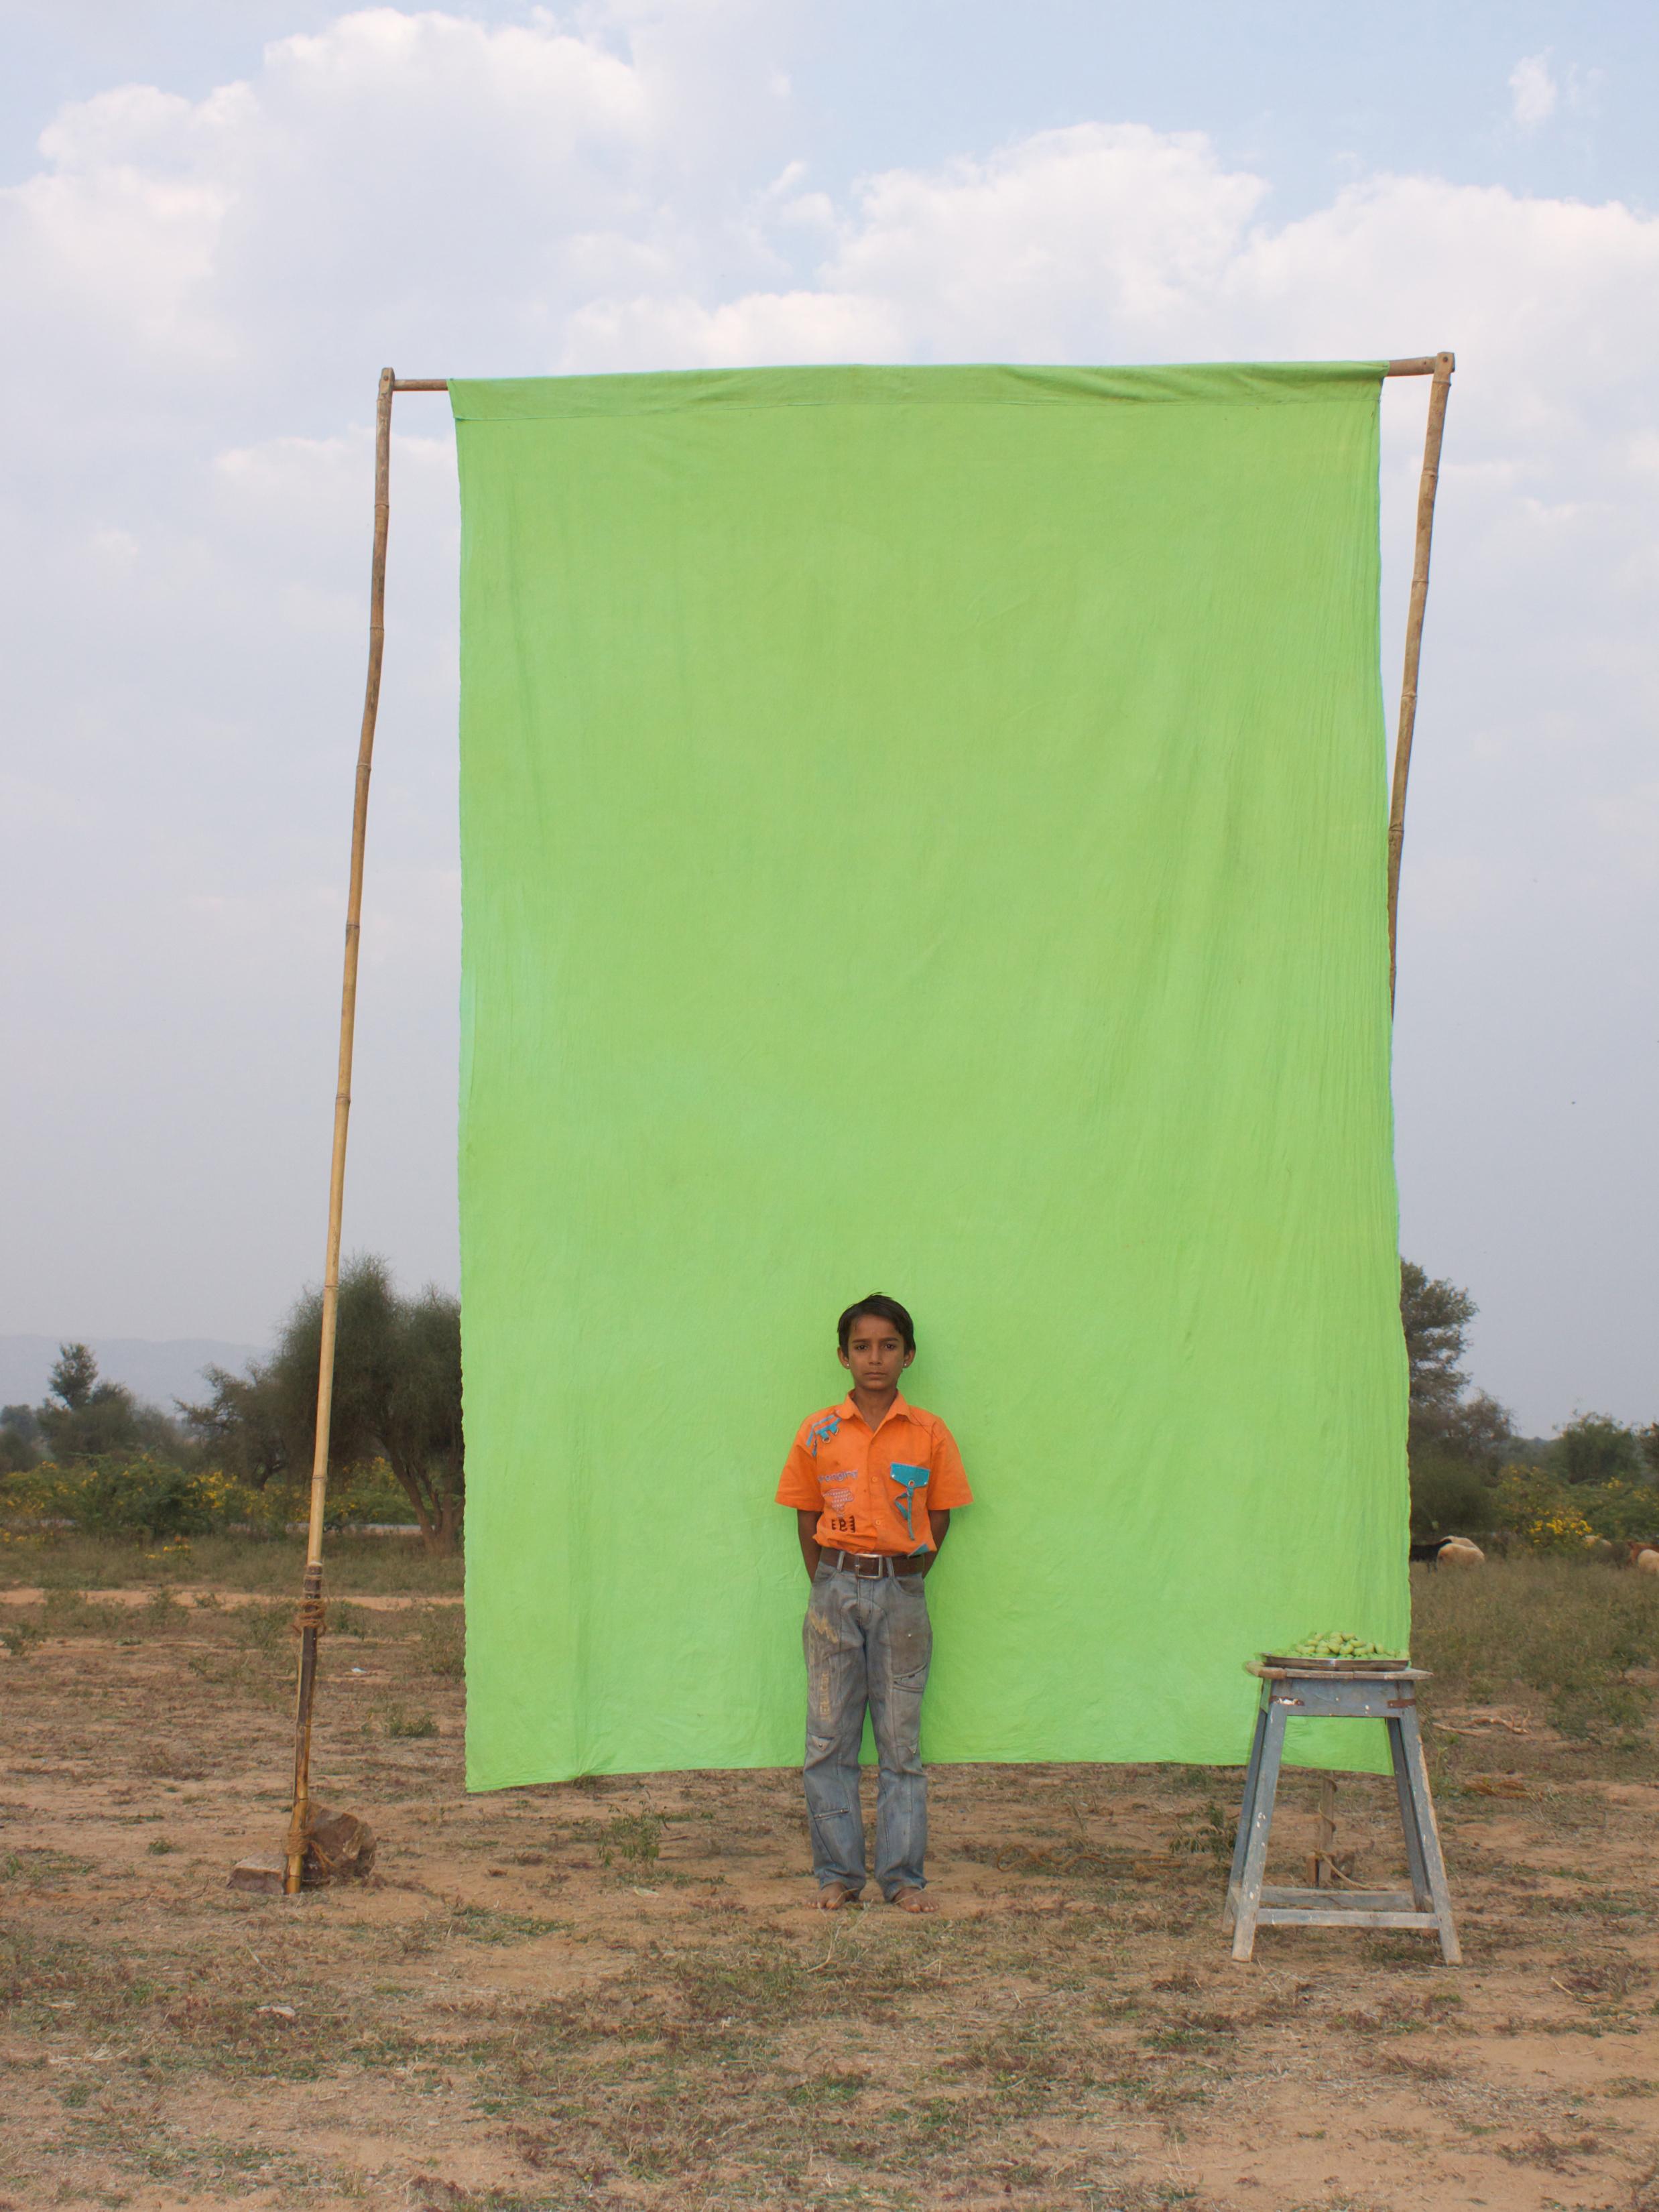 Benjamin Faga   Chroma Green No. 12    C-print    30 x 40 inches